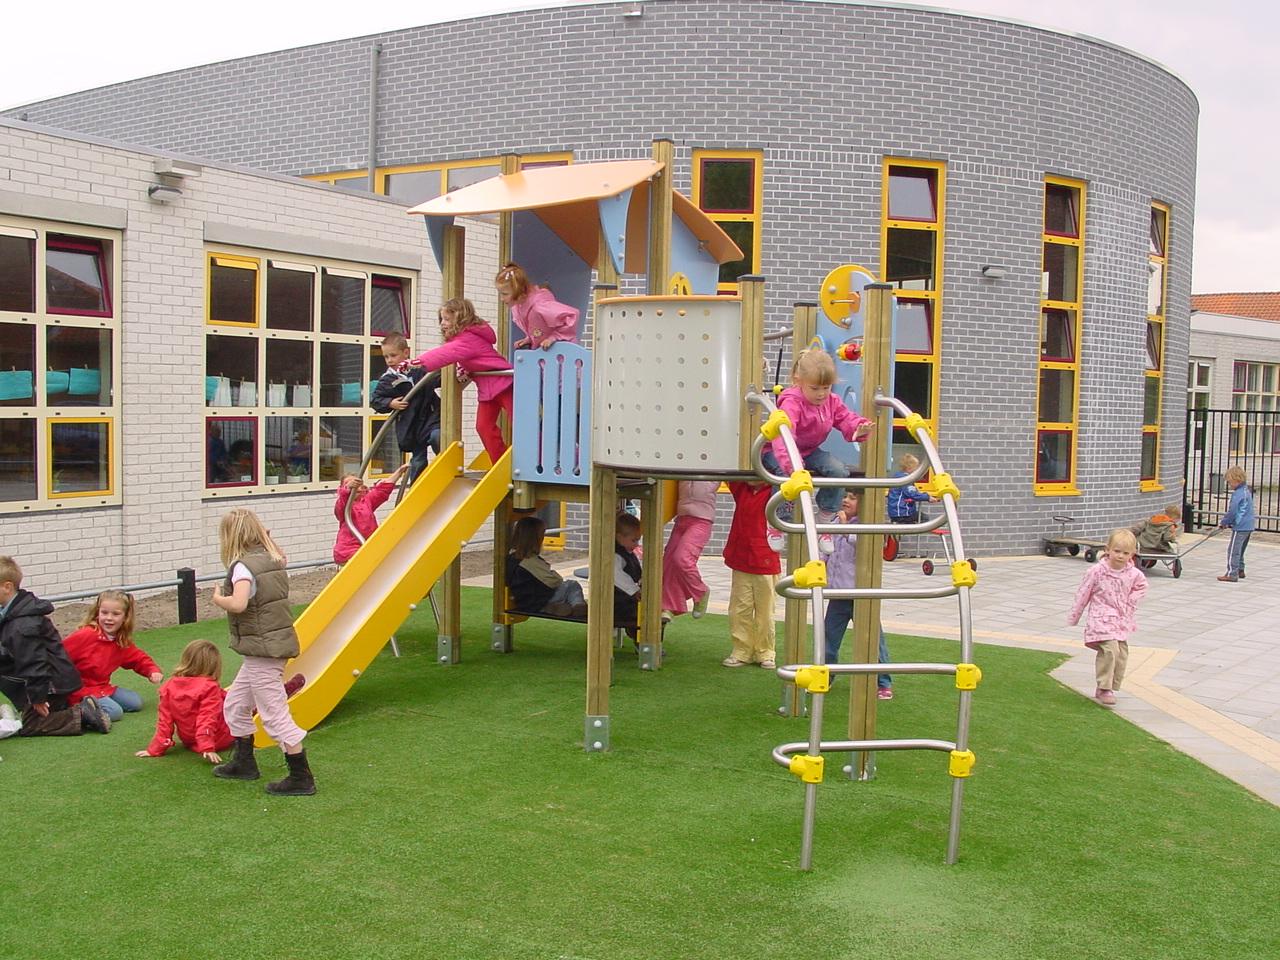 Johannesschool, Hillegom